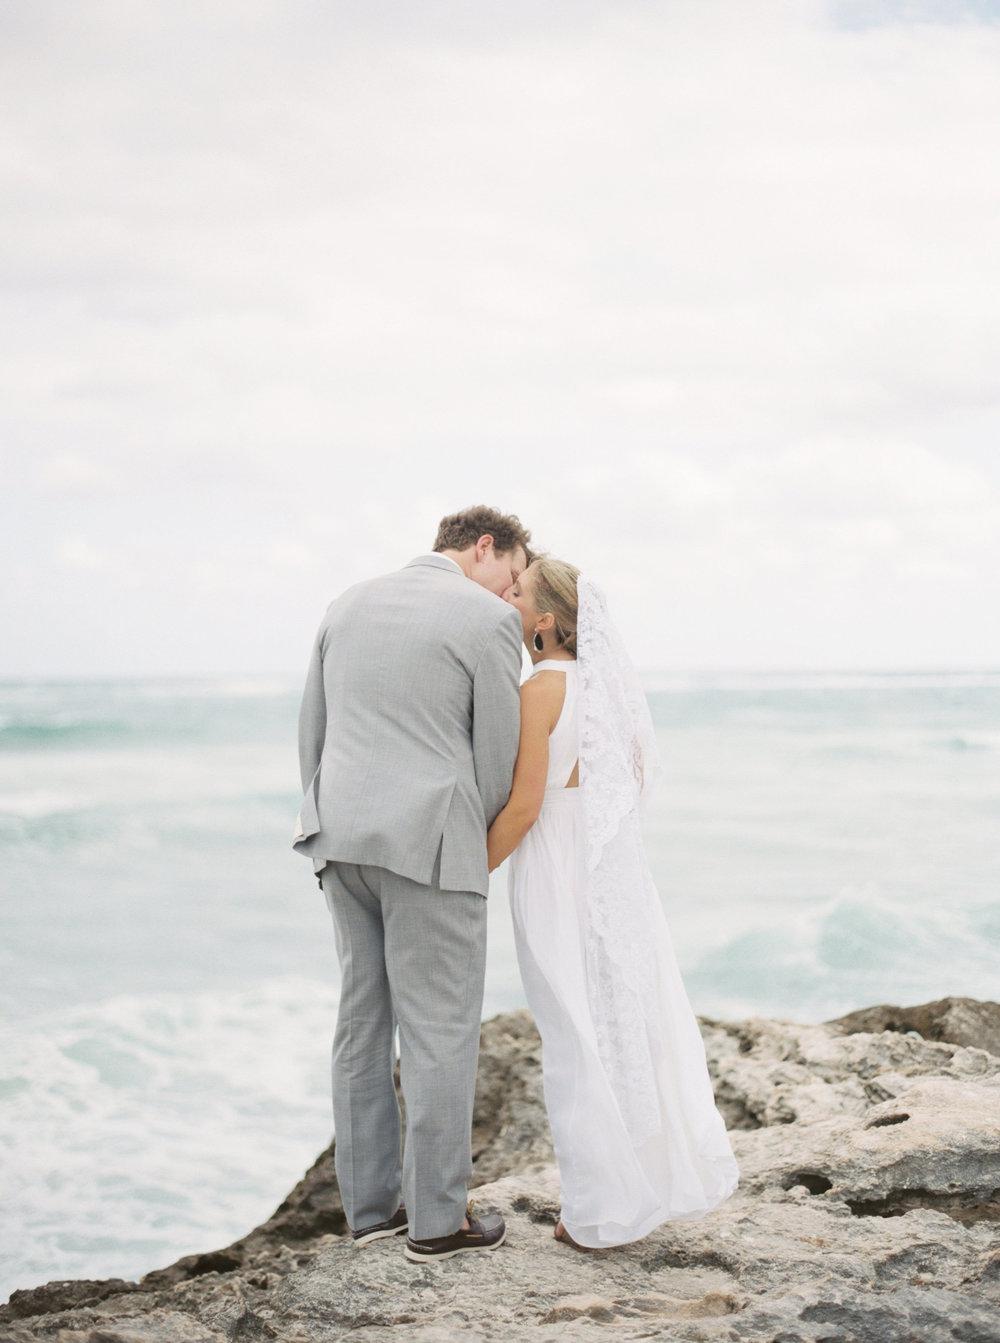 Kyle John l Fine Art Wedding Photography l Chicago, Copenhagen, California, New York, Destination l Blog l Lauren & Greg_25